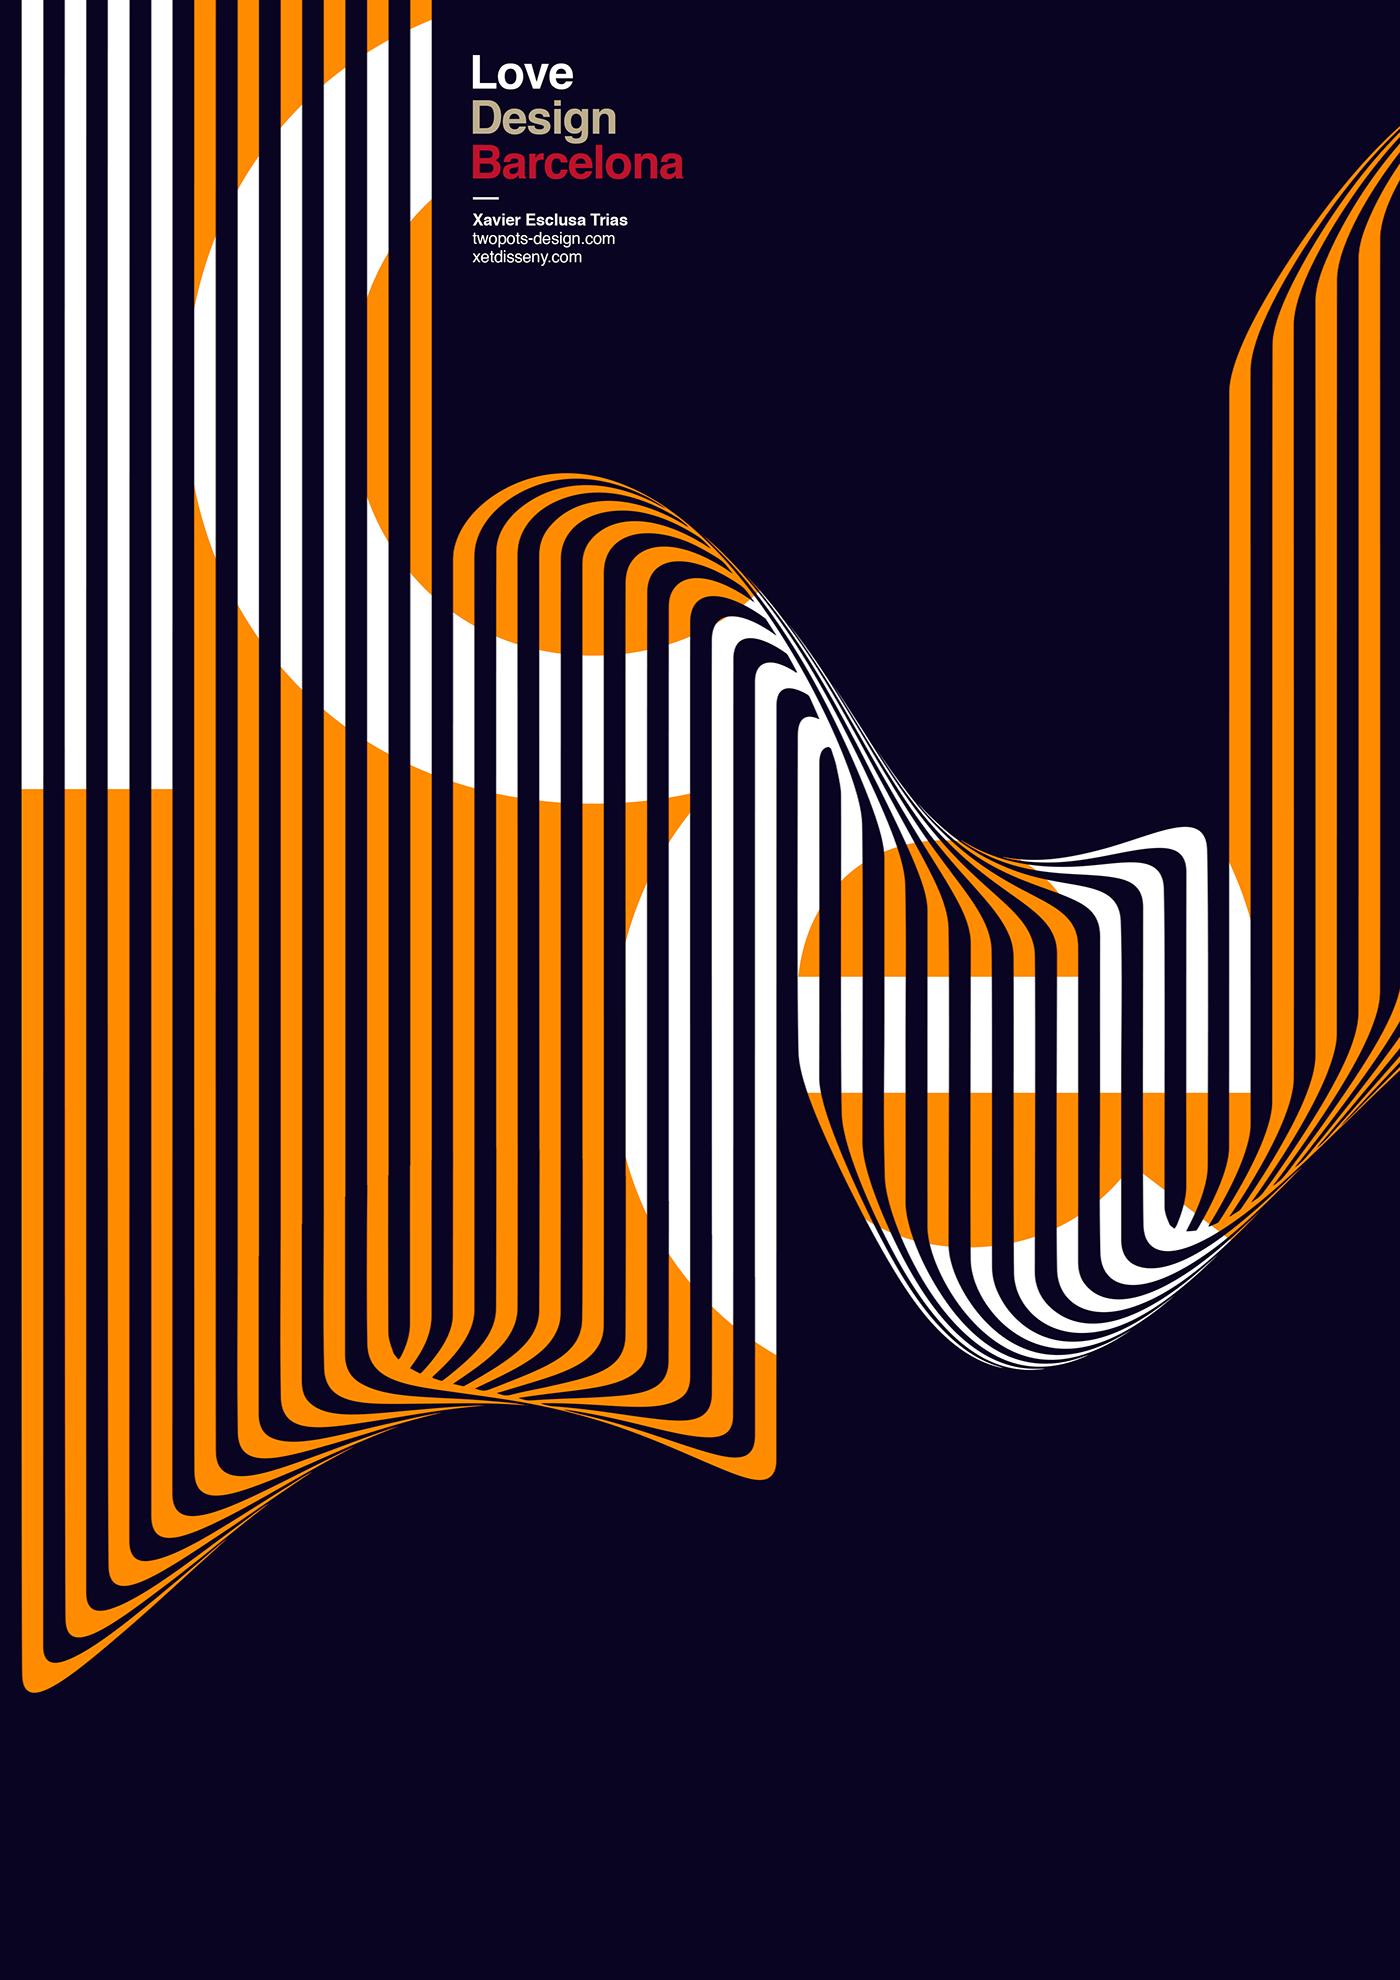 posters Xavier Esclusa Trias design poster art direction  barcelona posters design graphic design  Behance swiss style